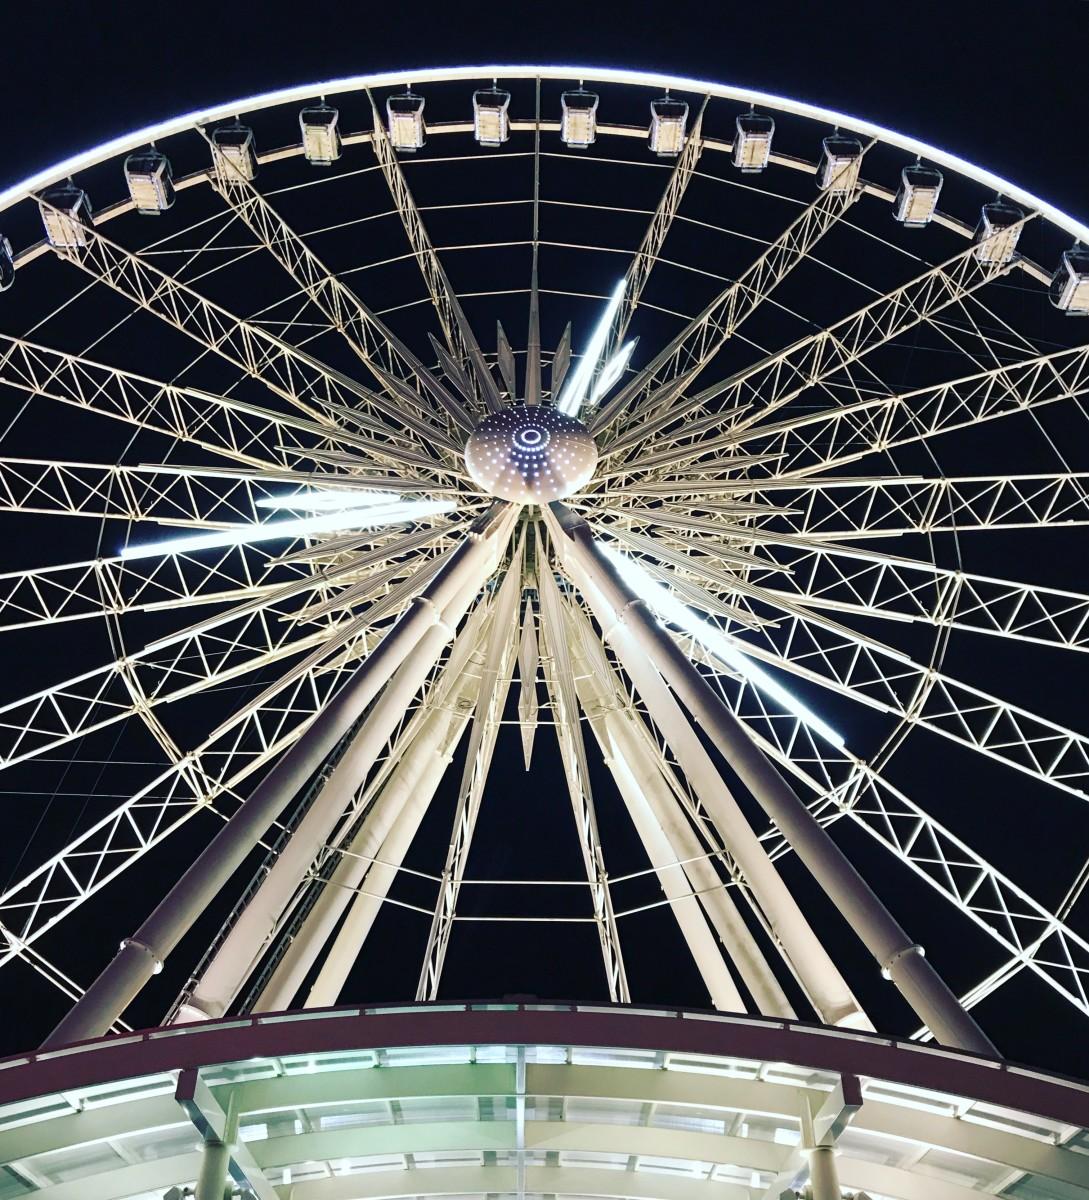 The Niagara SkyWheel.  What a ride, especially at night!